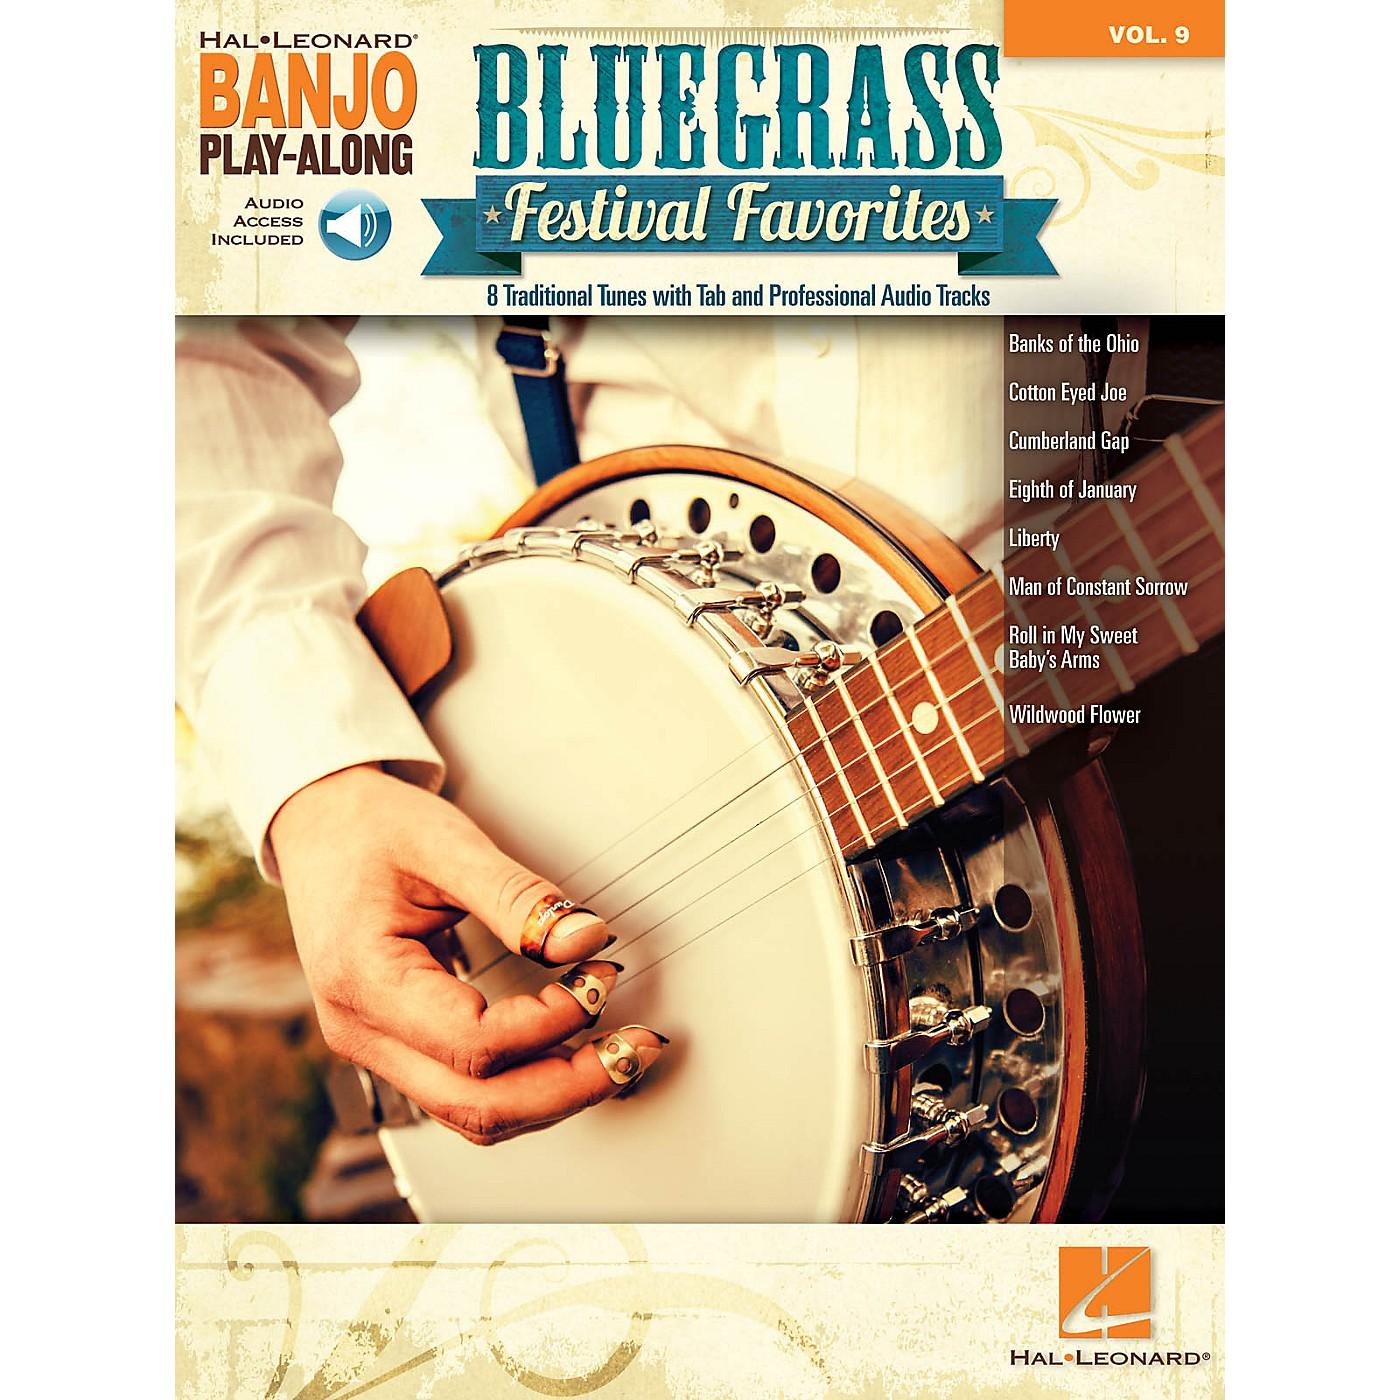 Hal Leonard Bluegrass Festival Favorites Banjo Play-Along Volume 9 Book/Audio Online thumbnail